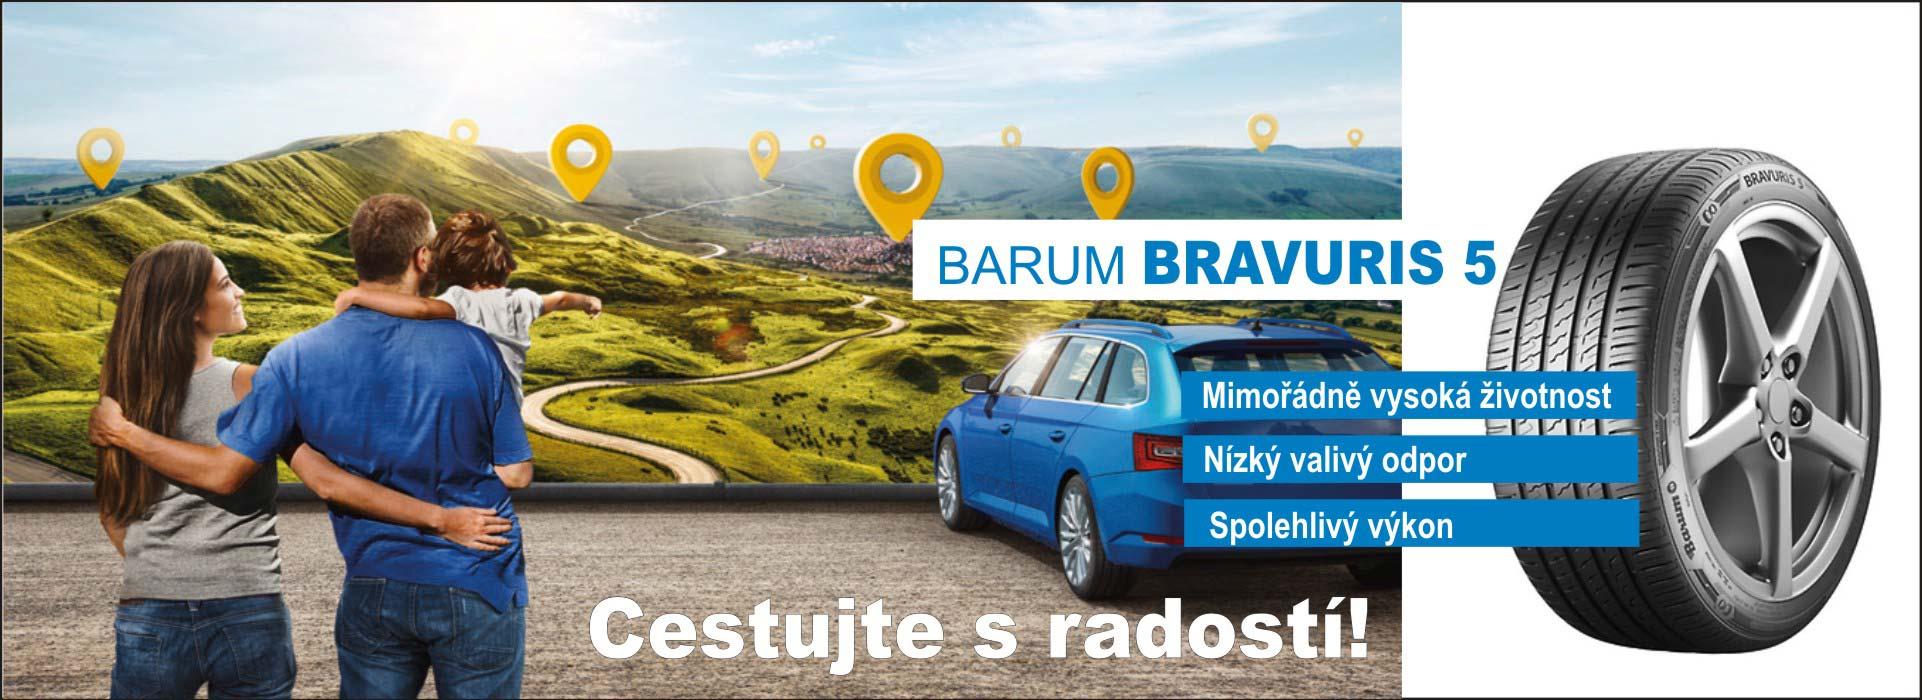 bravuris5